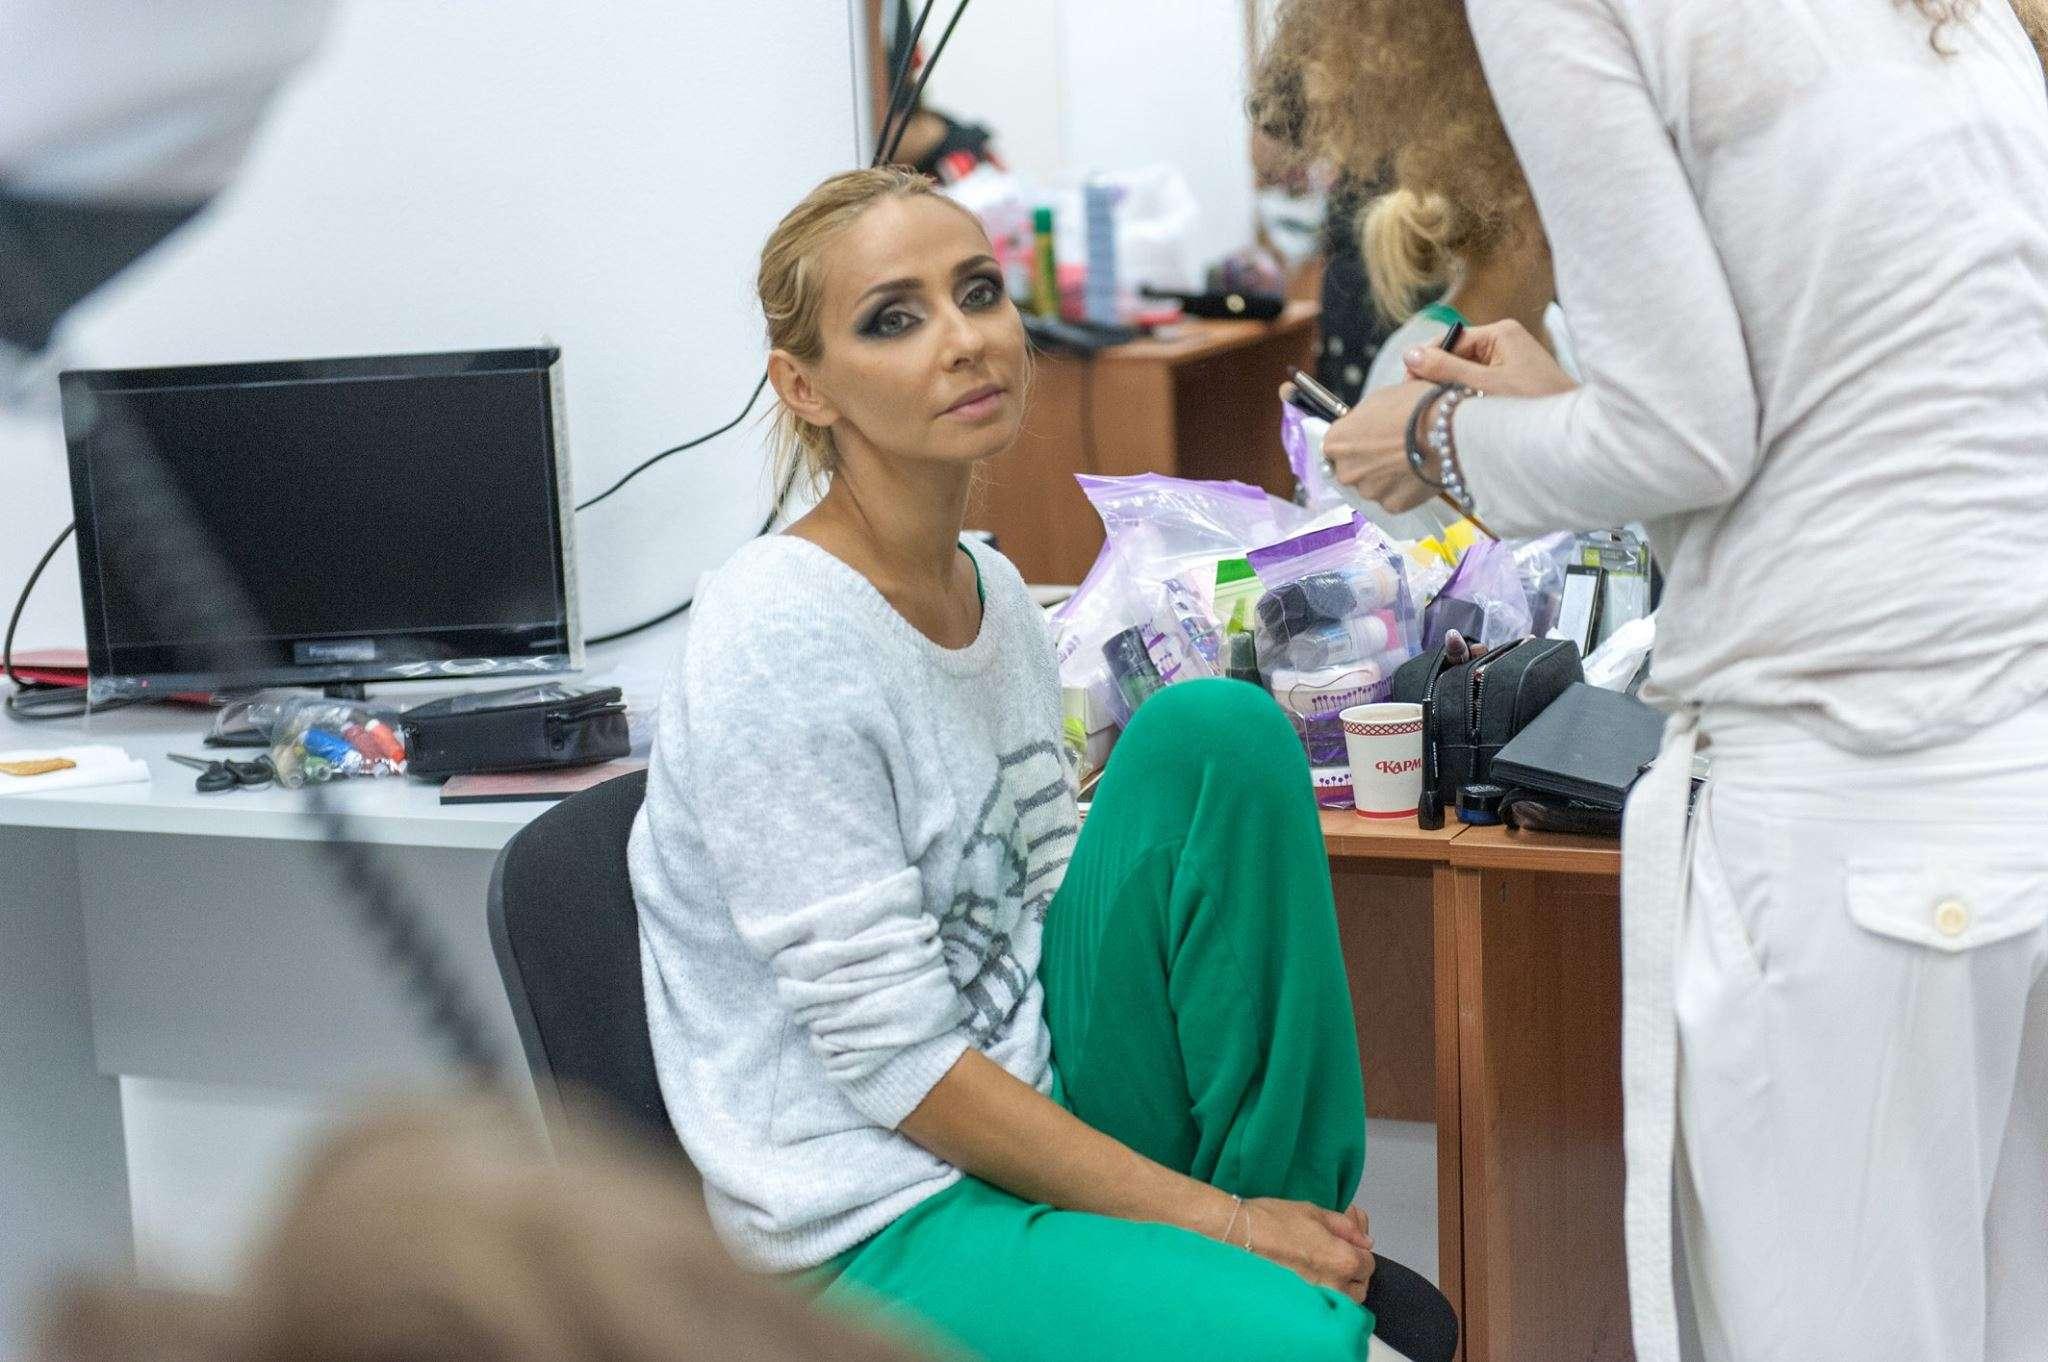 Татьяна Навка. Пресса - Страница 7 11700911